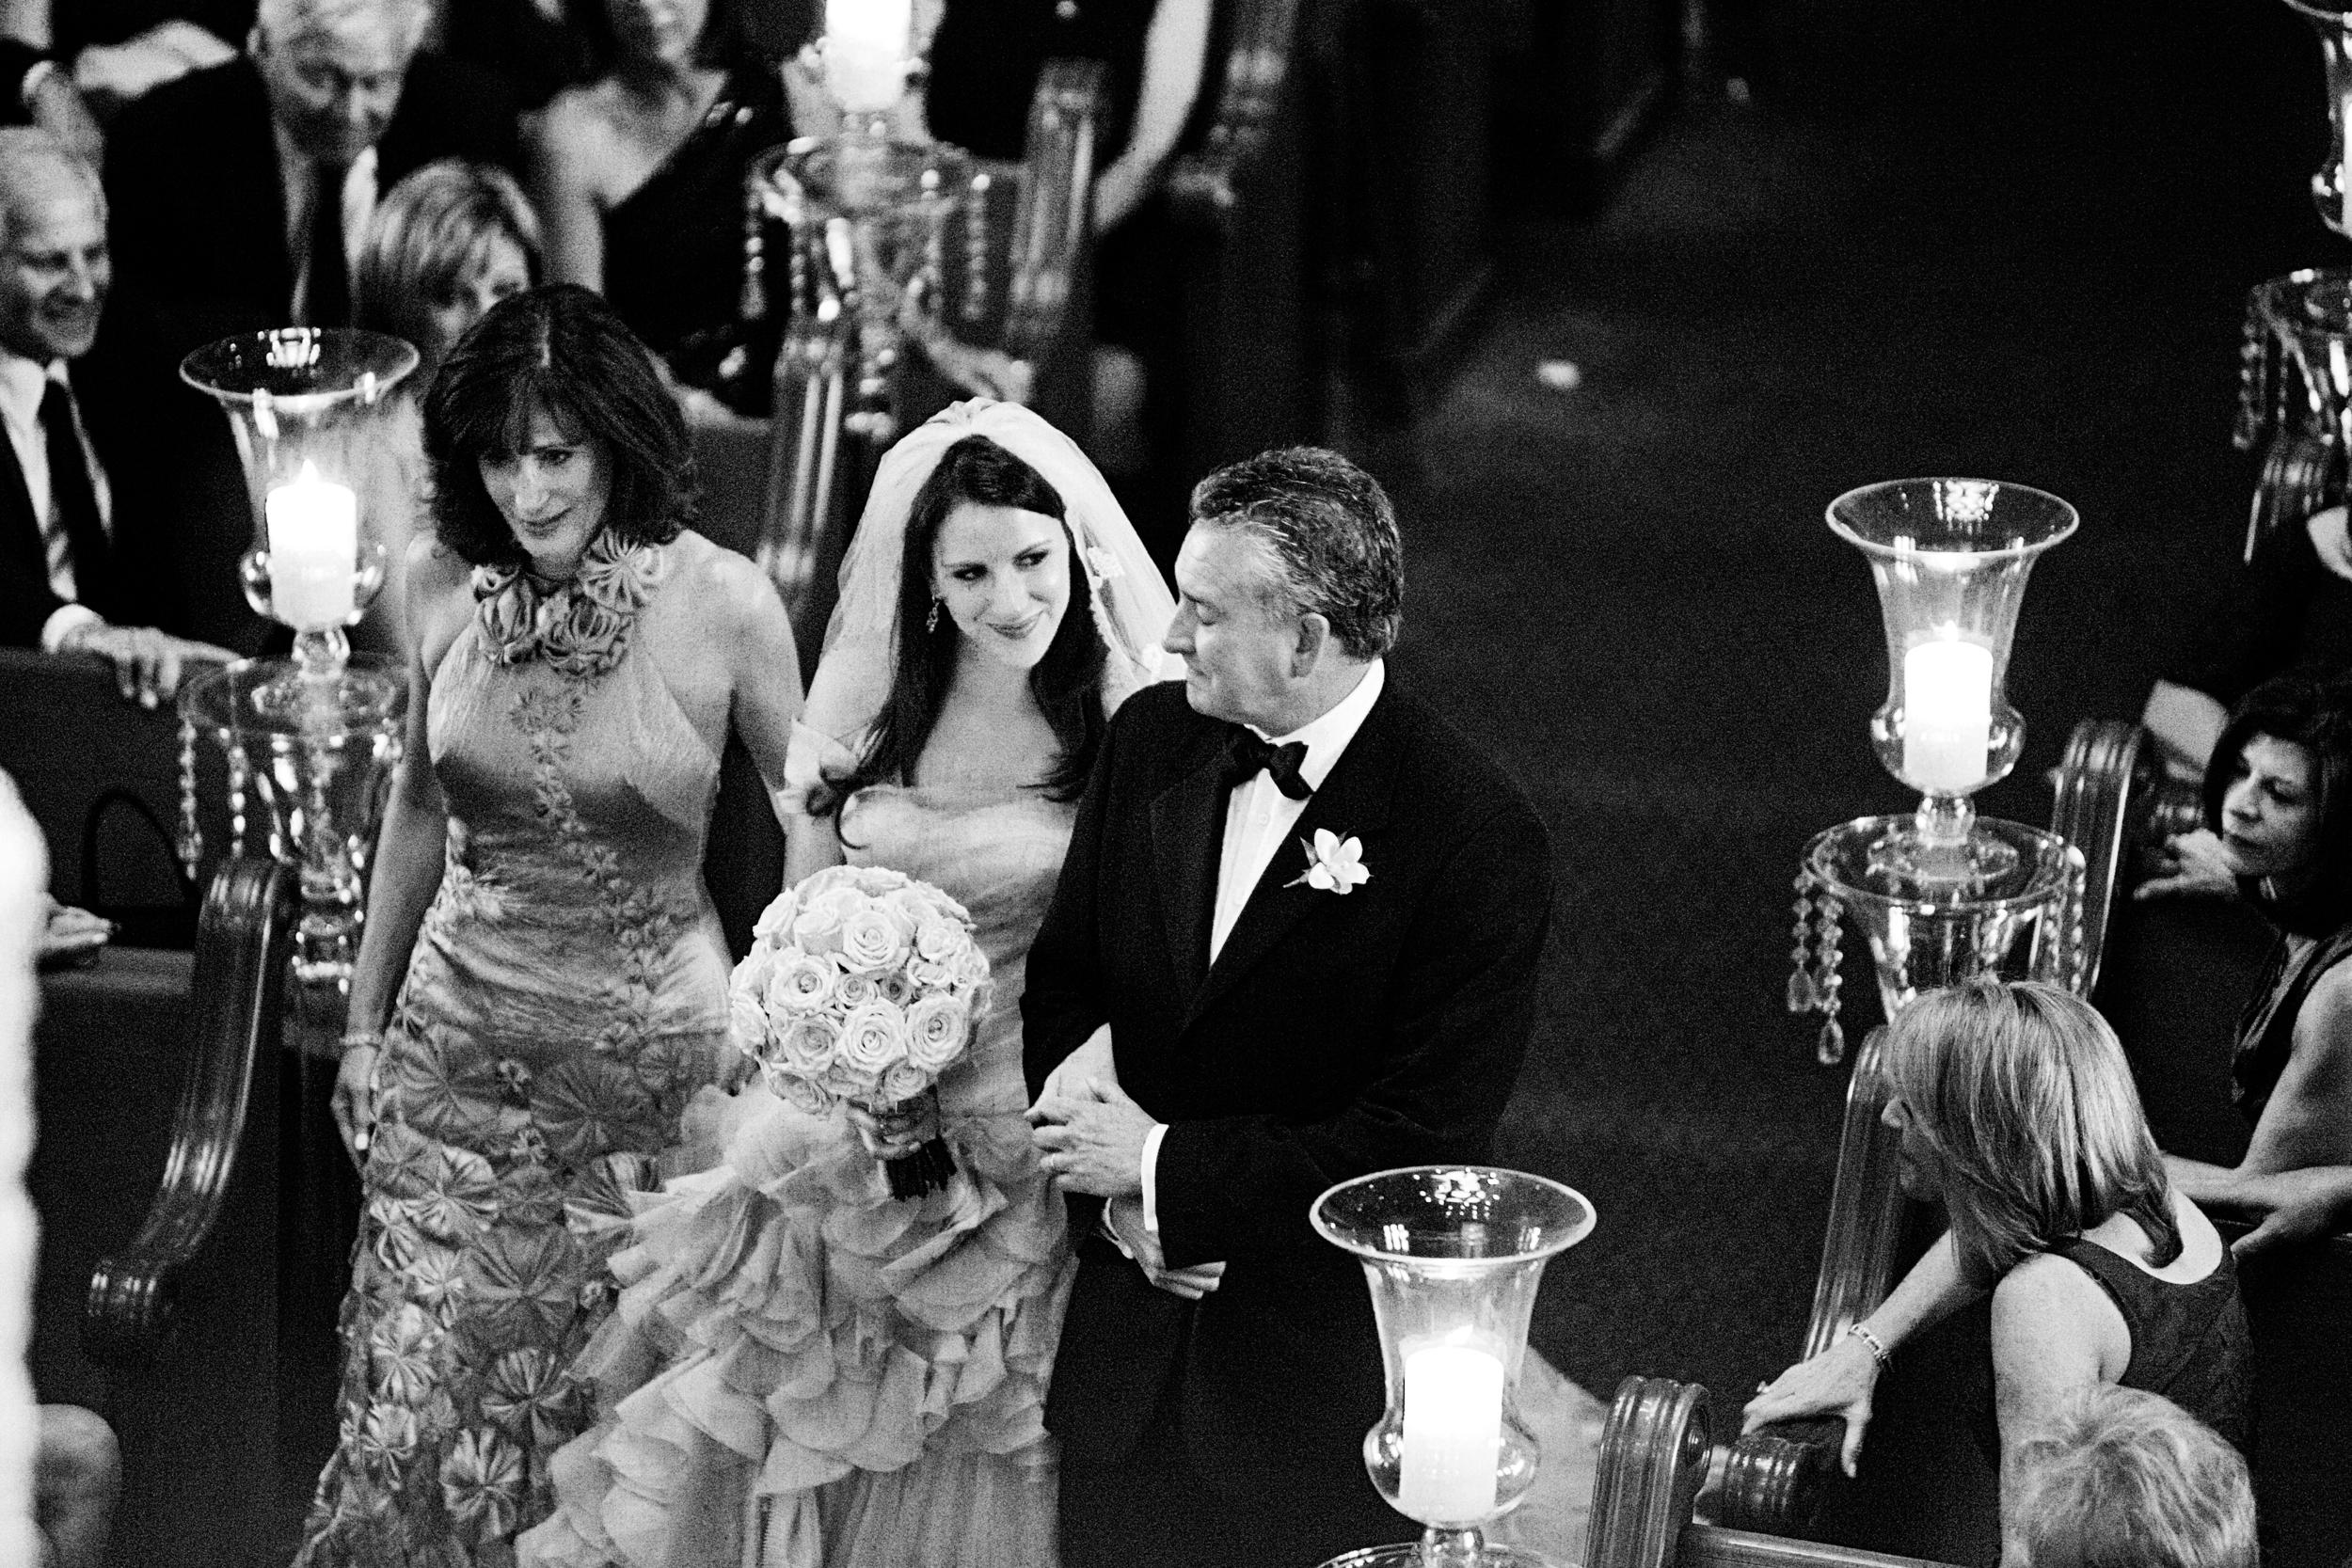 Ceci_New_York_Ceci_Style_Ceci_Johnson_Luxury_Lifestyle_Floral_Lace_Wedding_Letterpress_Inspiration_Design_Custom_Couture_Personalized_Invitations_-12.jpg